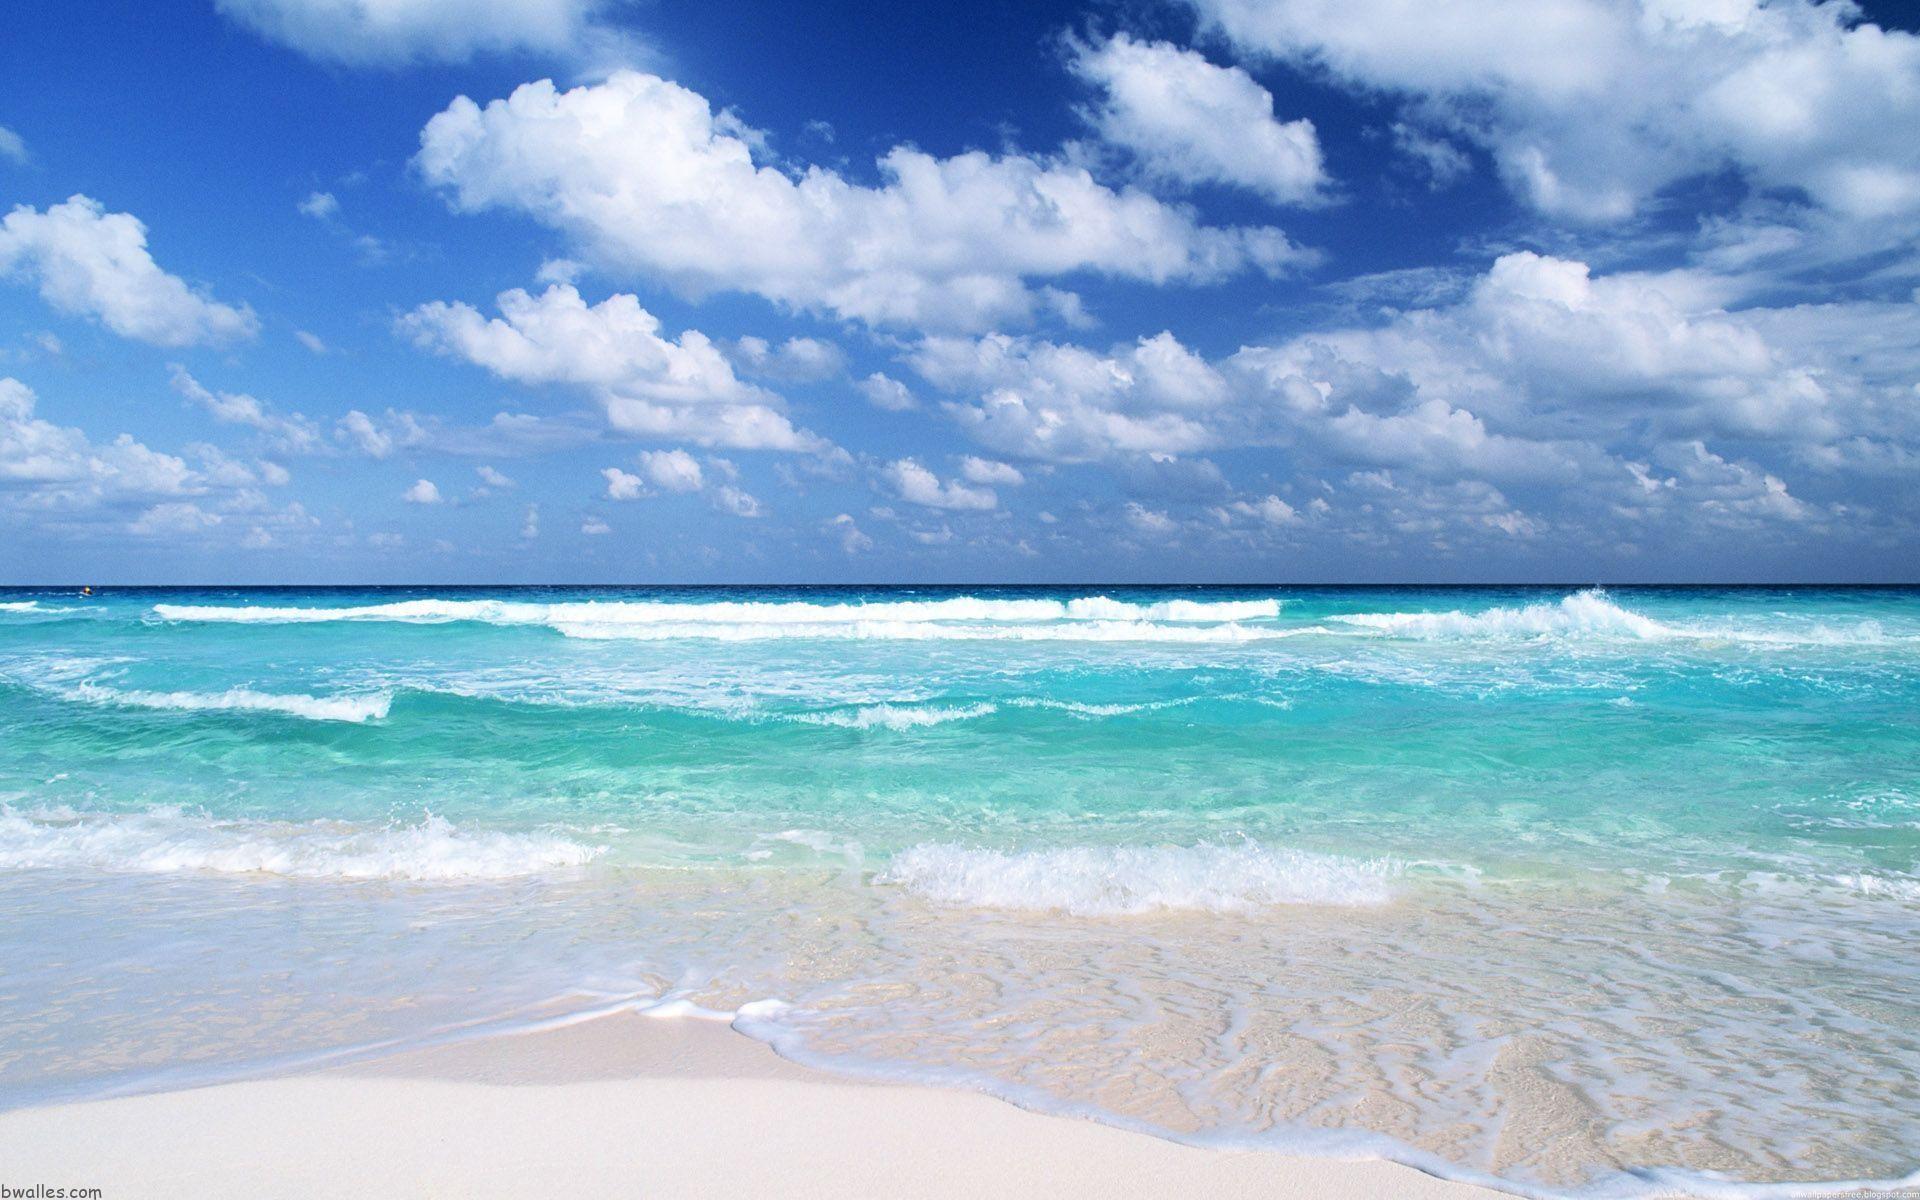 http://bwalles.com/wp-content/uploads/2013/08/Exotic-Beach-HQ-Wallpaper-2.jpg